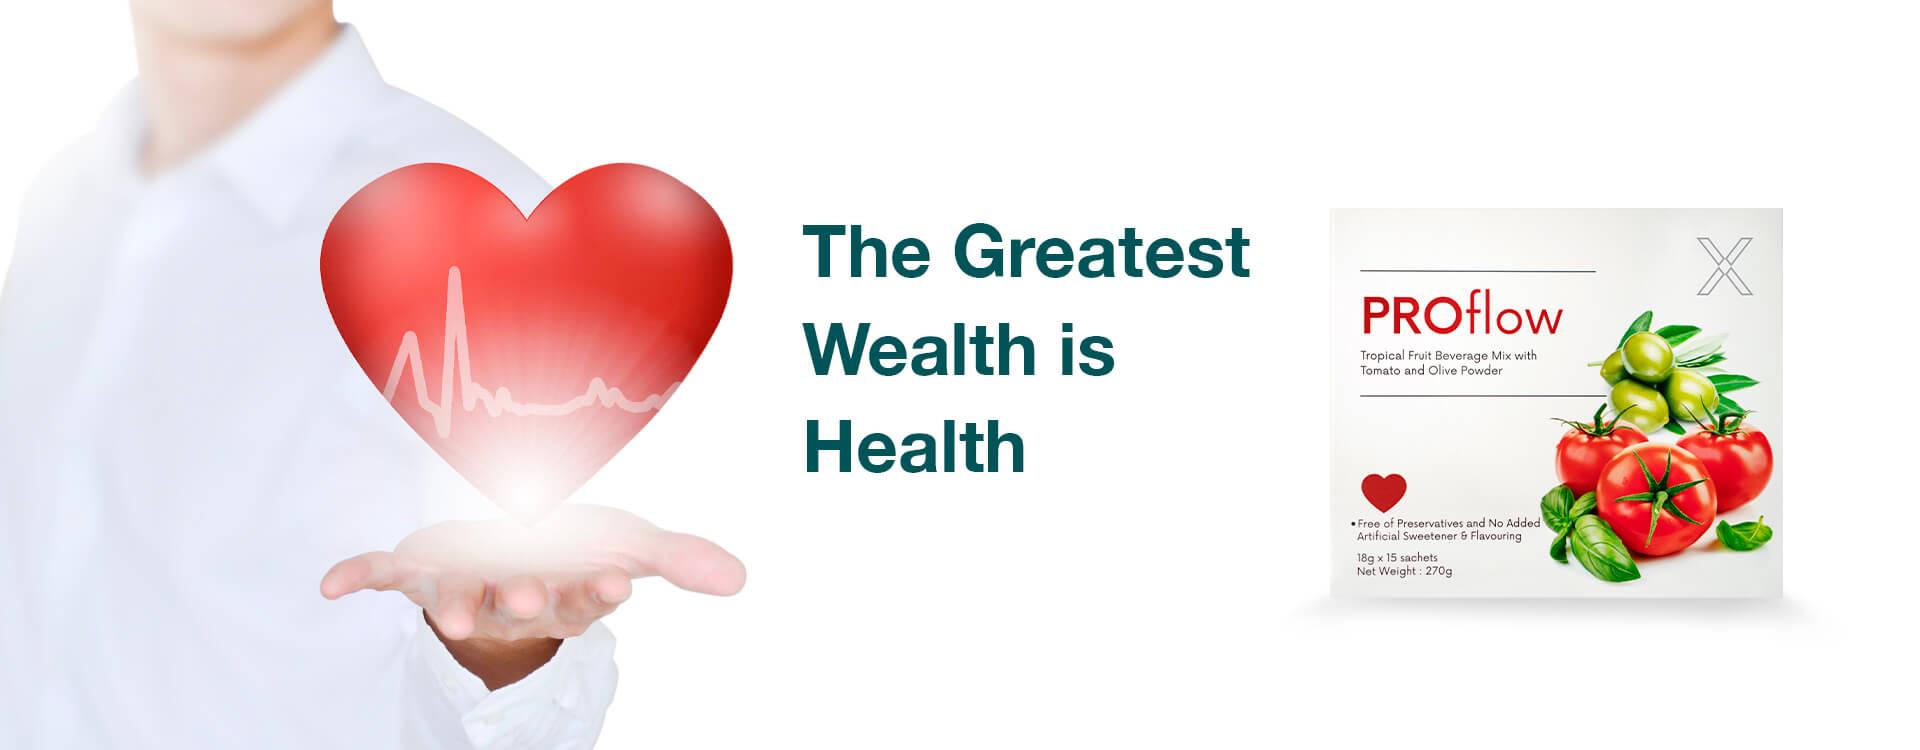 Moreth Heart Health